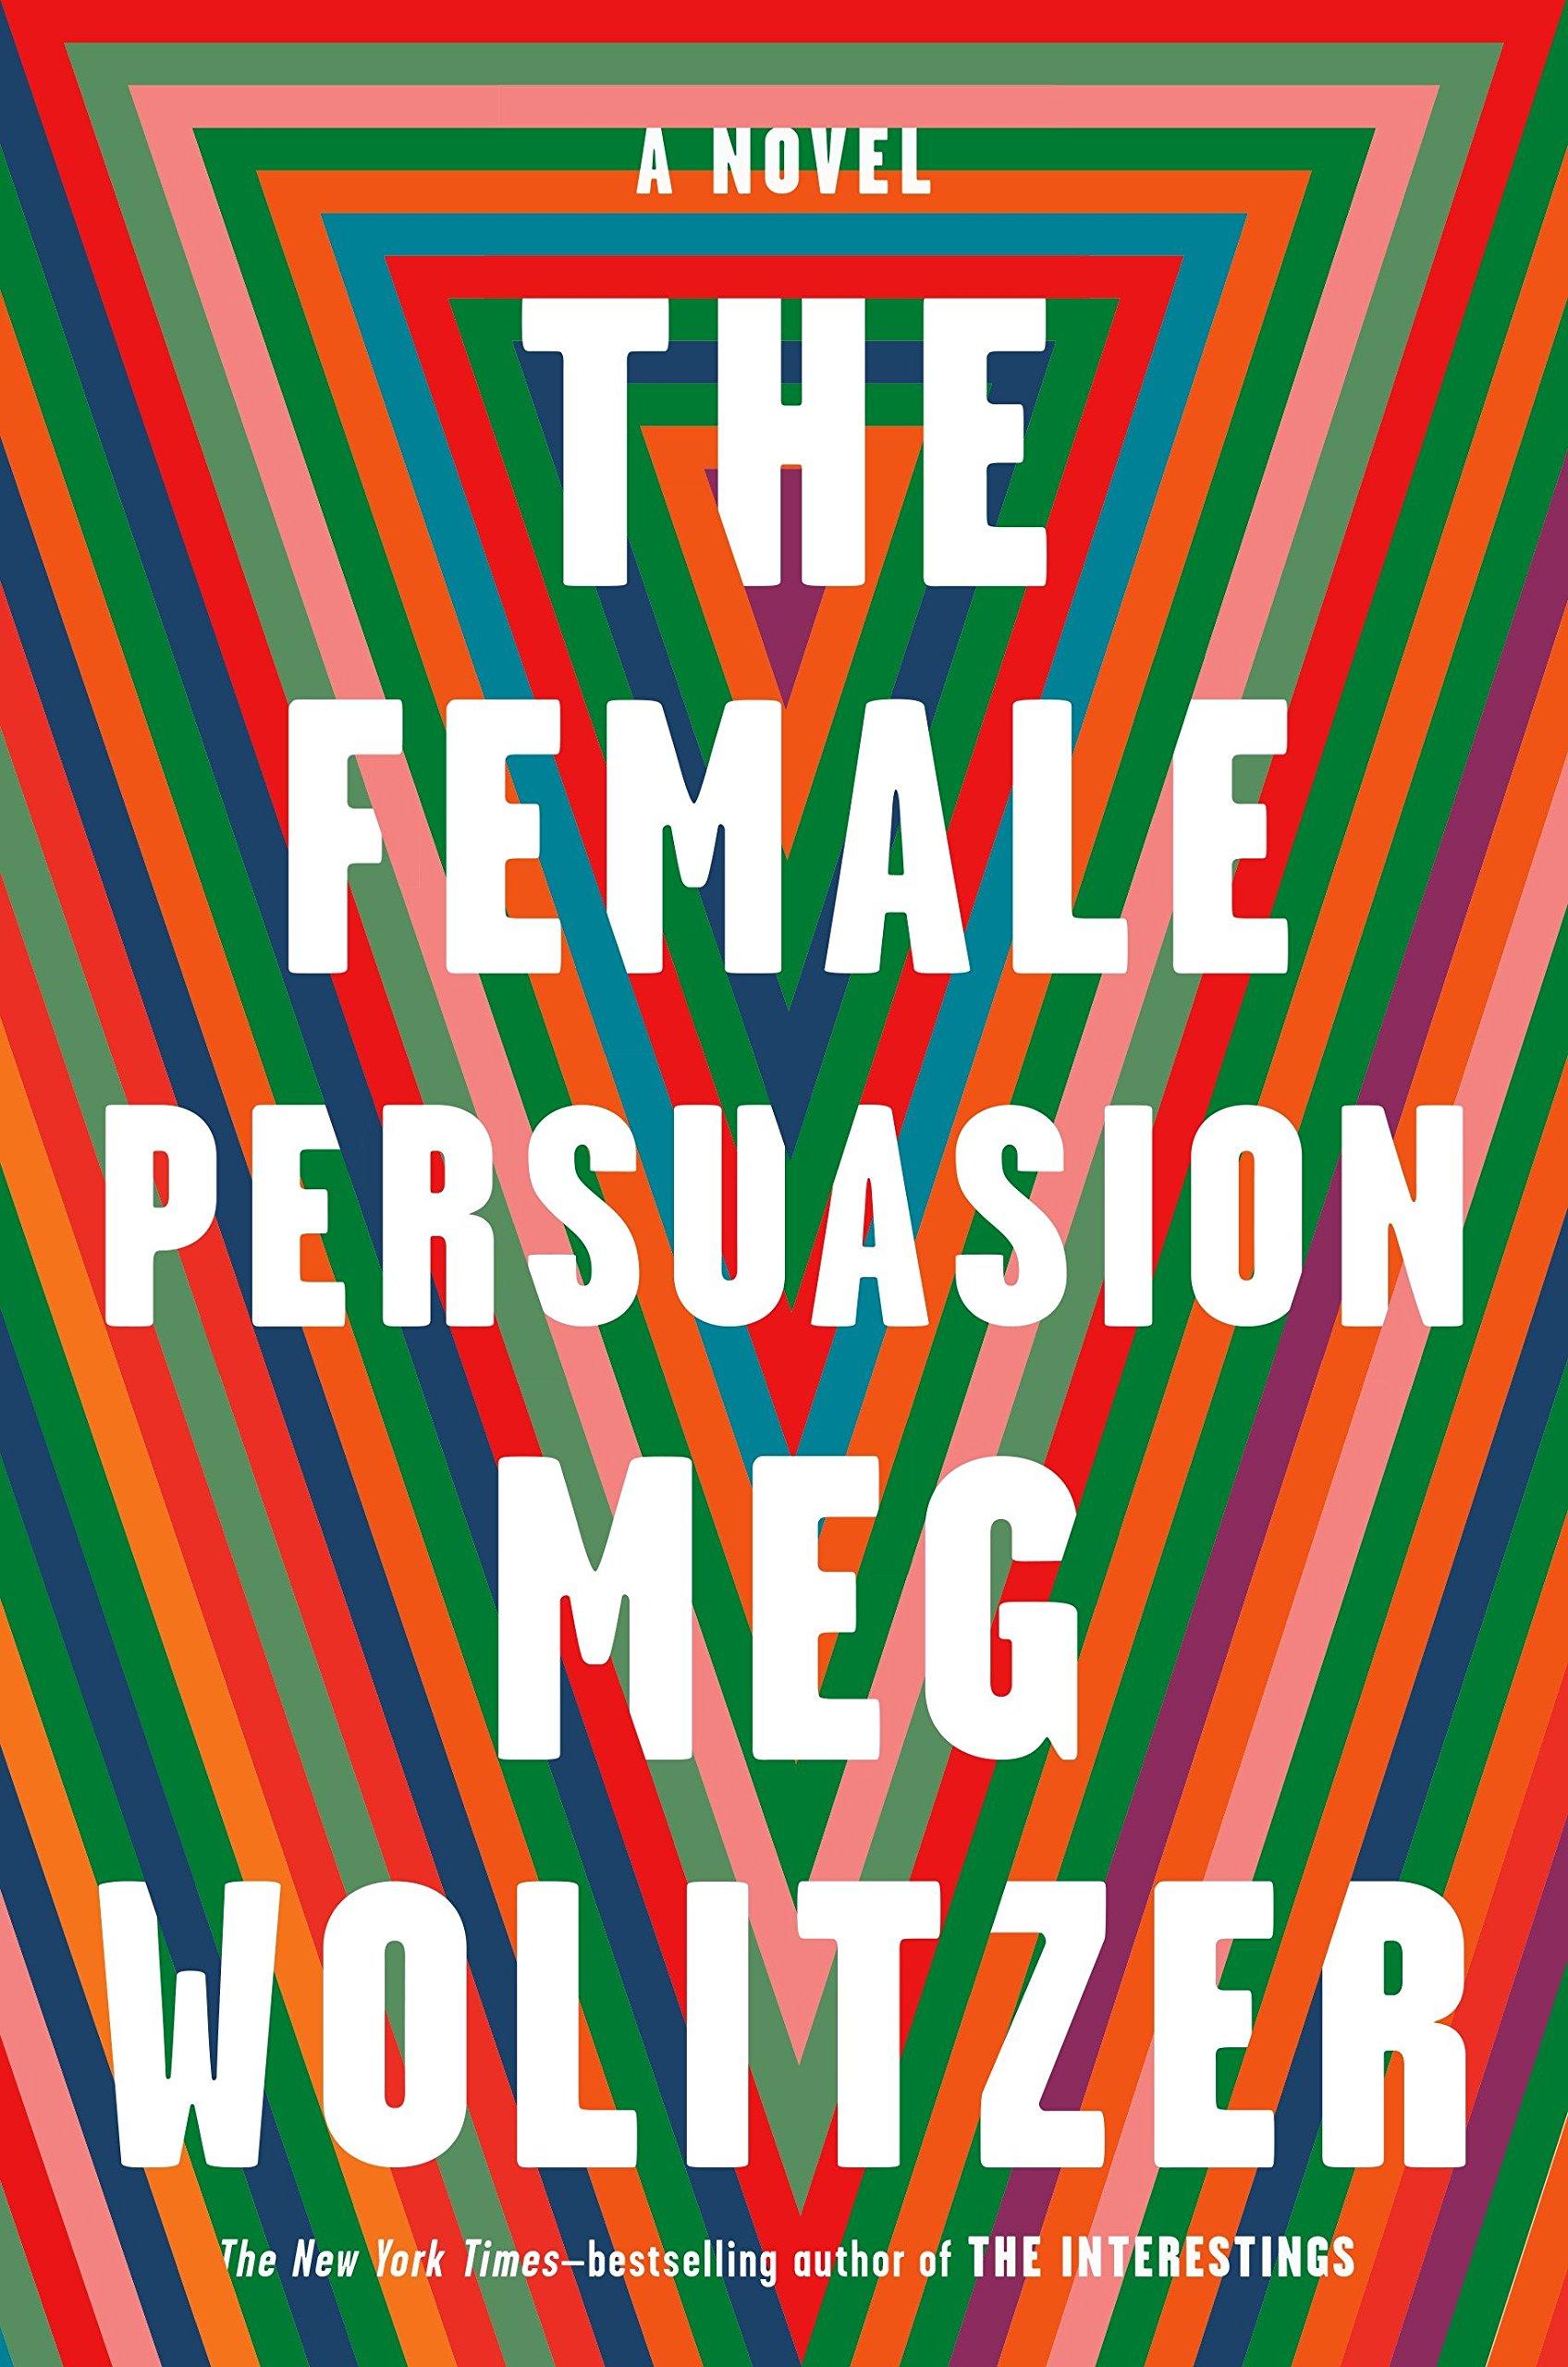 The Female Persuasion.jpg